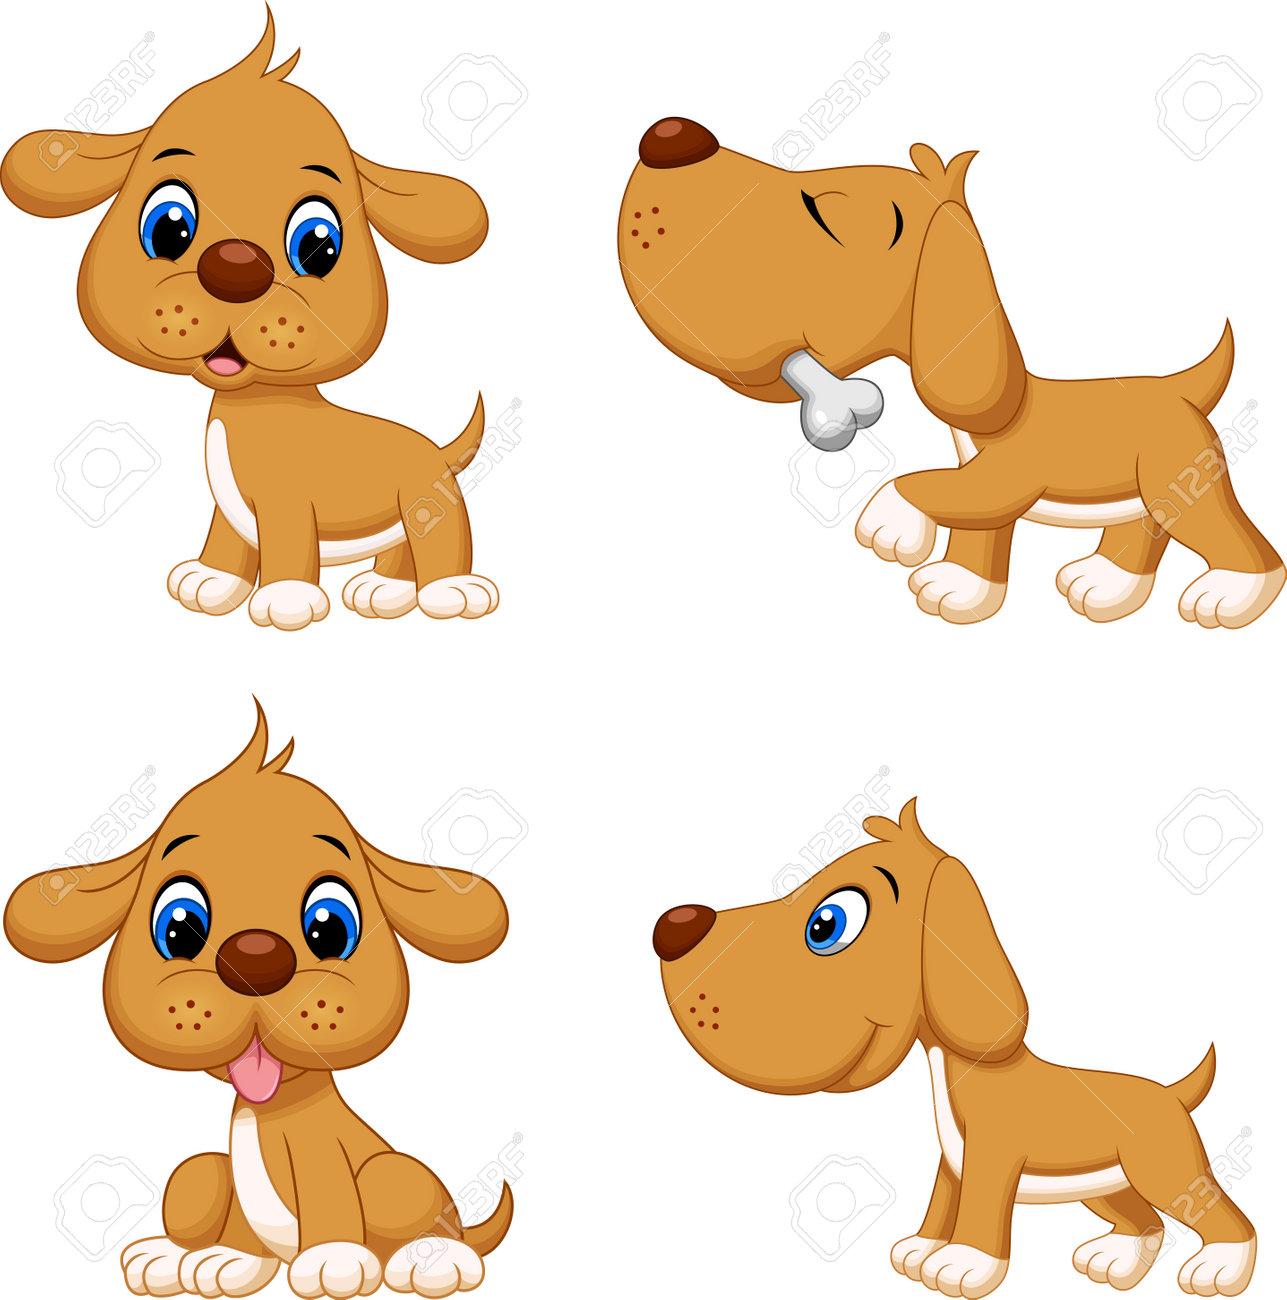 Illustration of cartoon dog collection set - 165285581